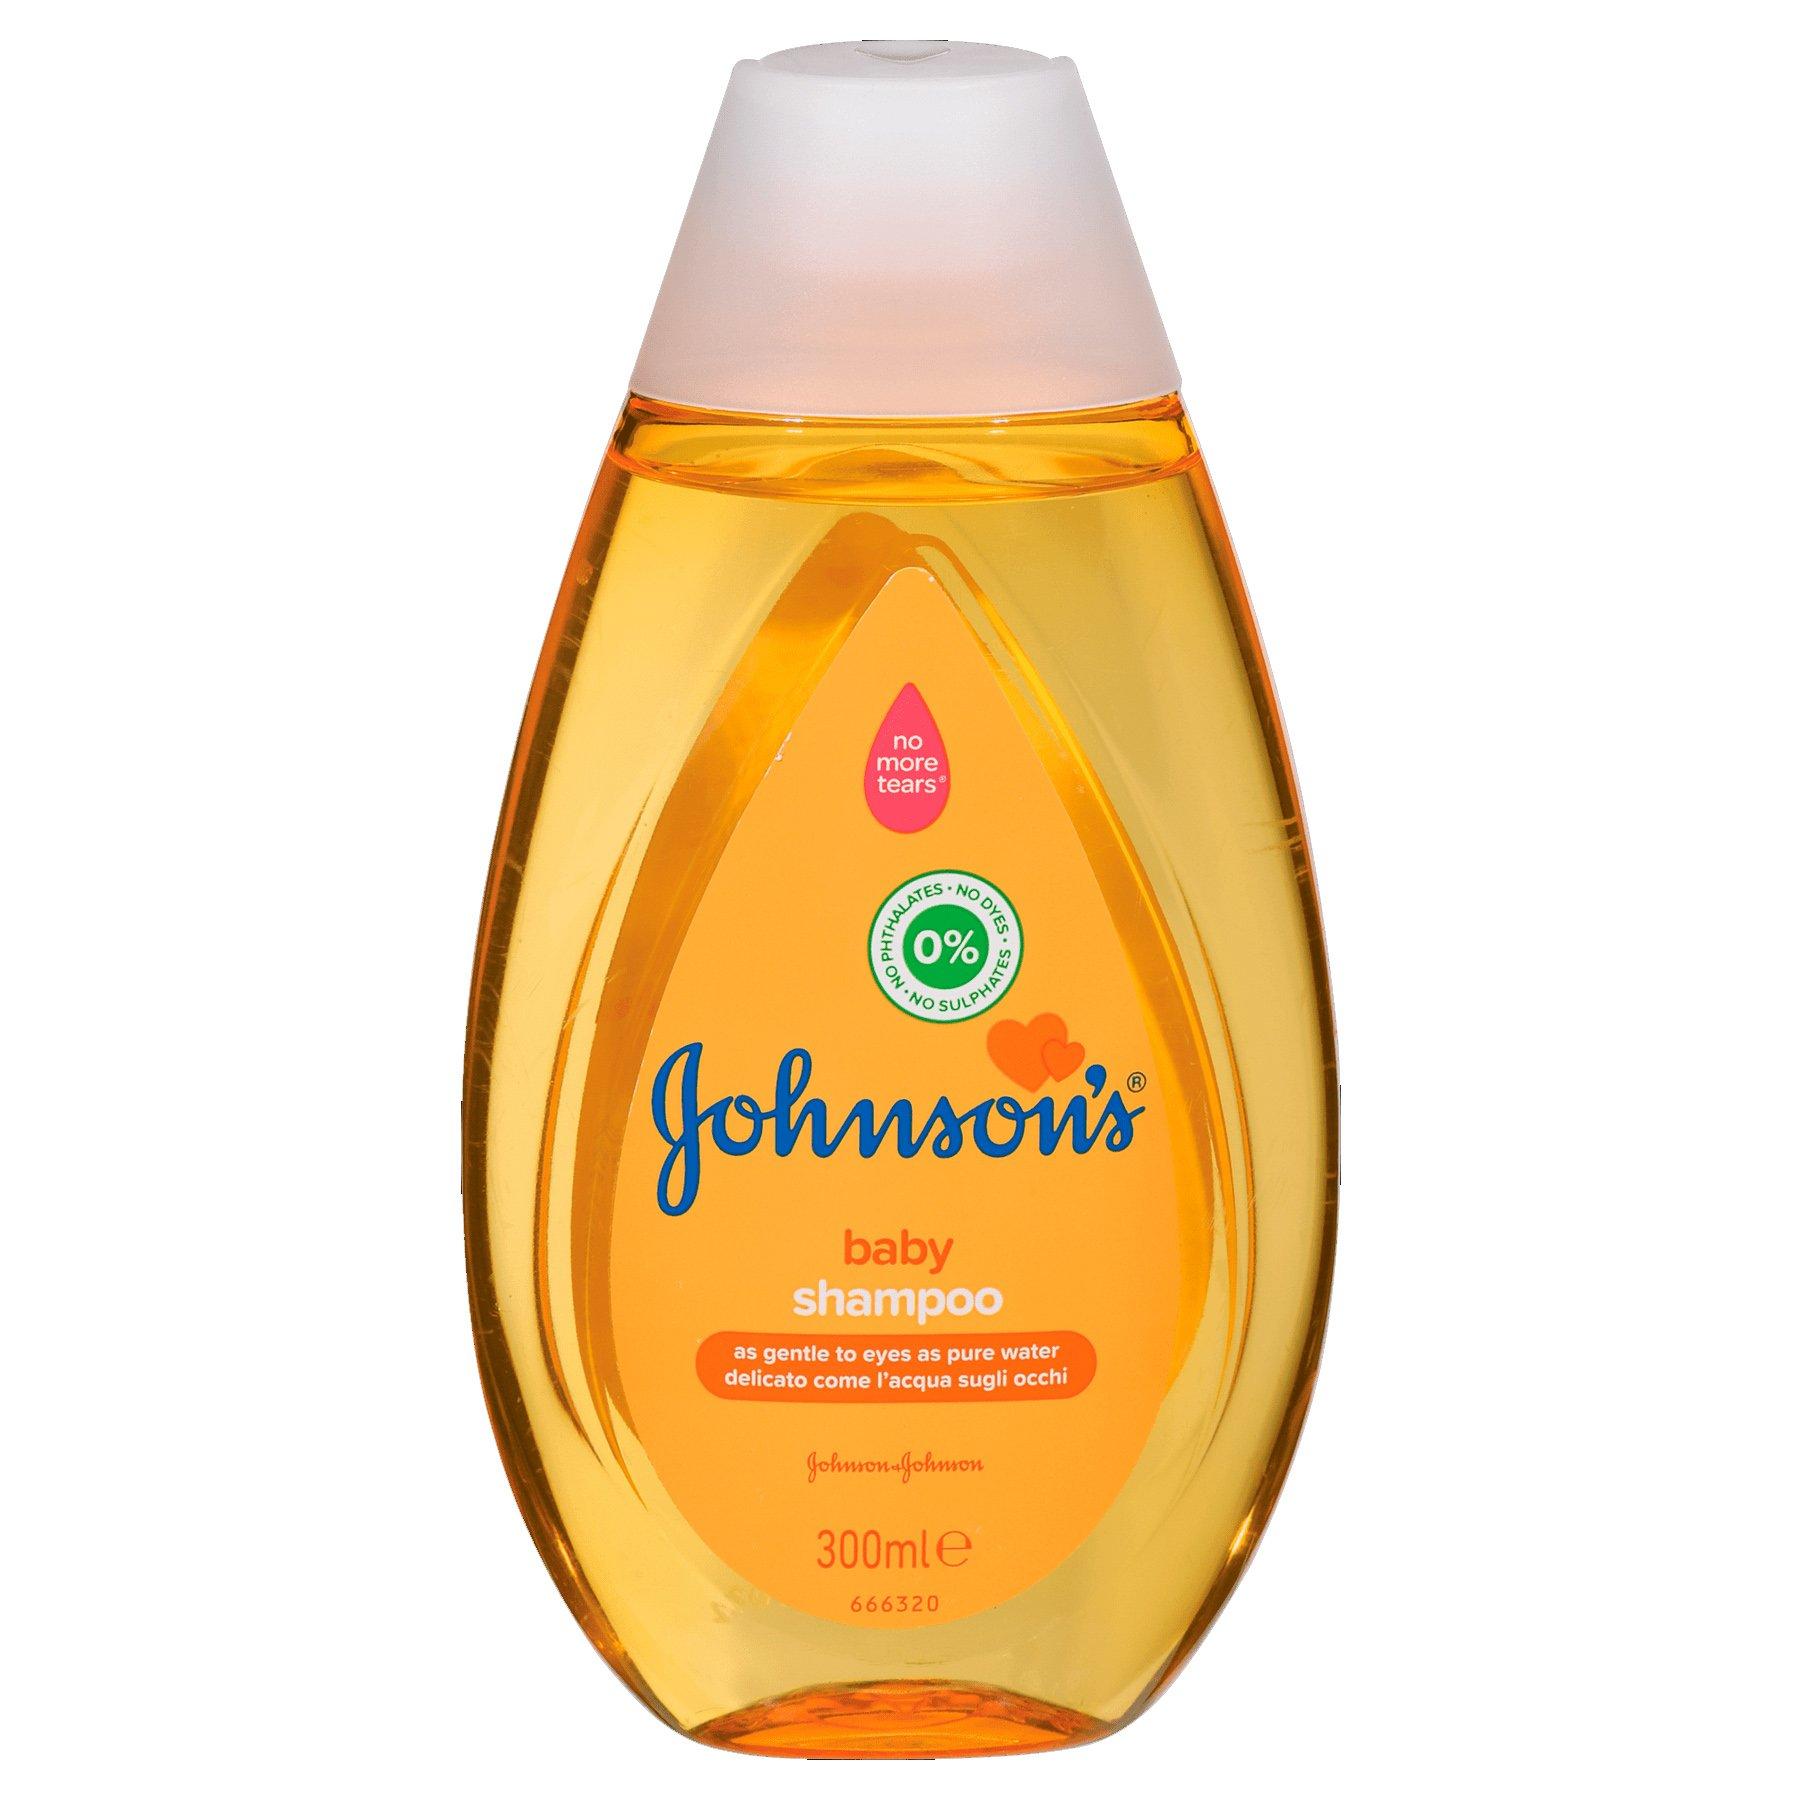 Johnson's Baby Shampoo Σαμπουάν Όχι πια Δάκρυα, Καθαρίζει Αποτελεσματικά Αφήνοντας τα Μαλλάκια του Μωρού Λεία και Λαμπερά 300ml